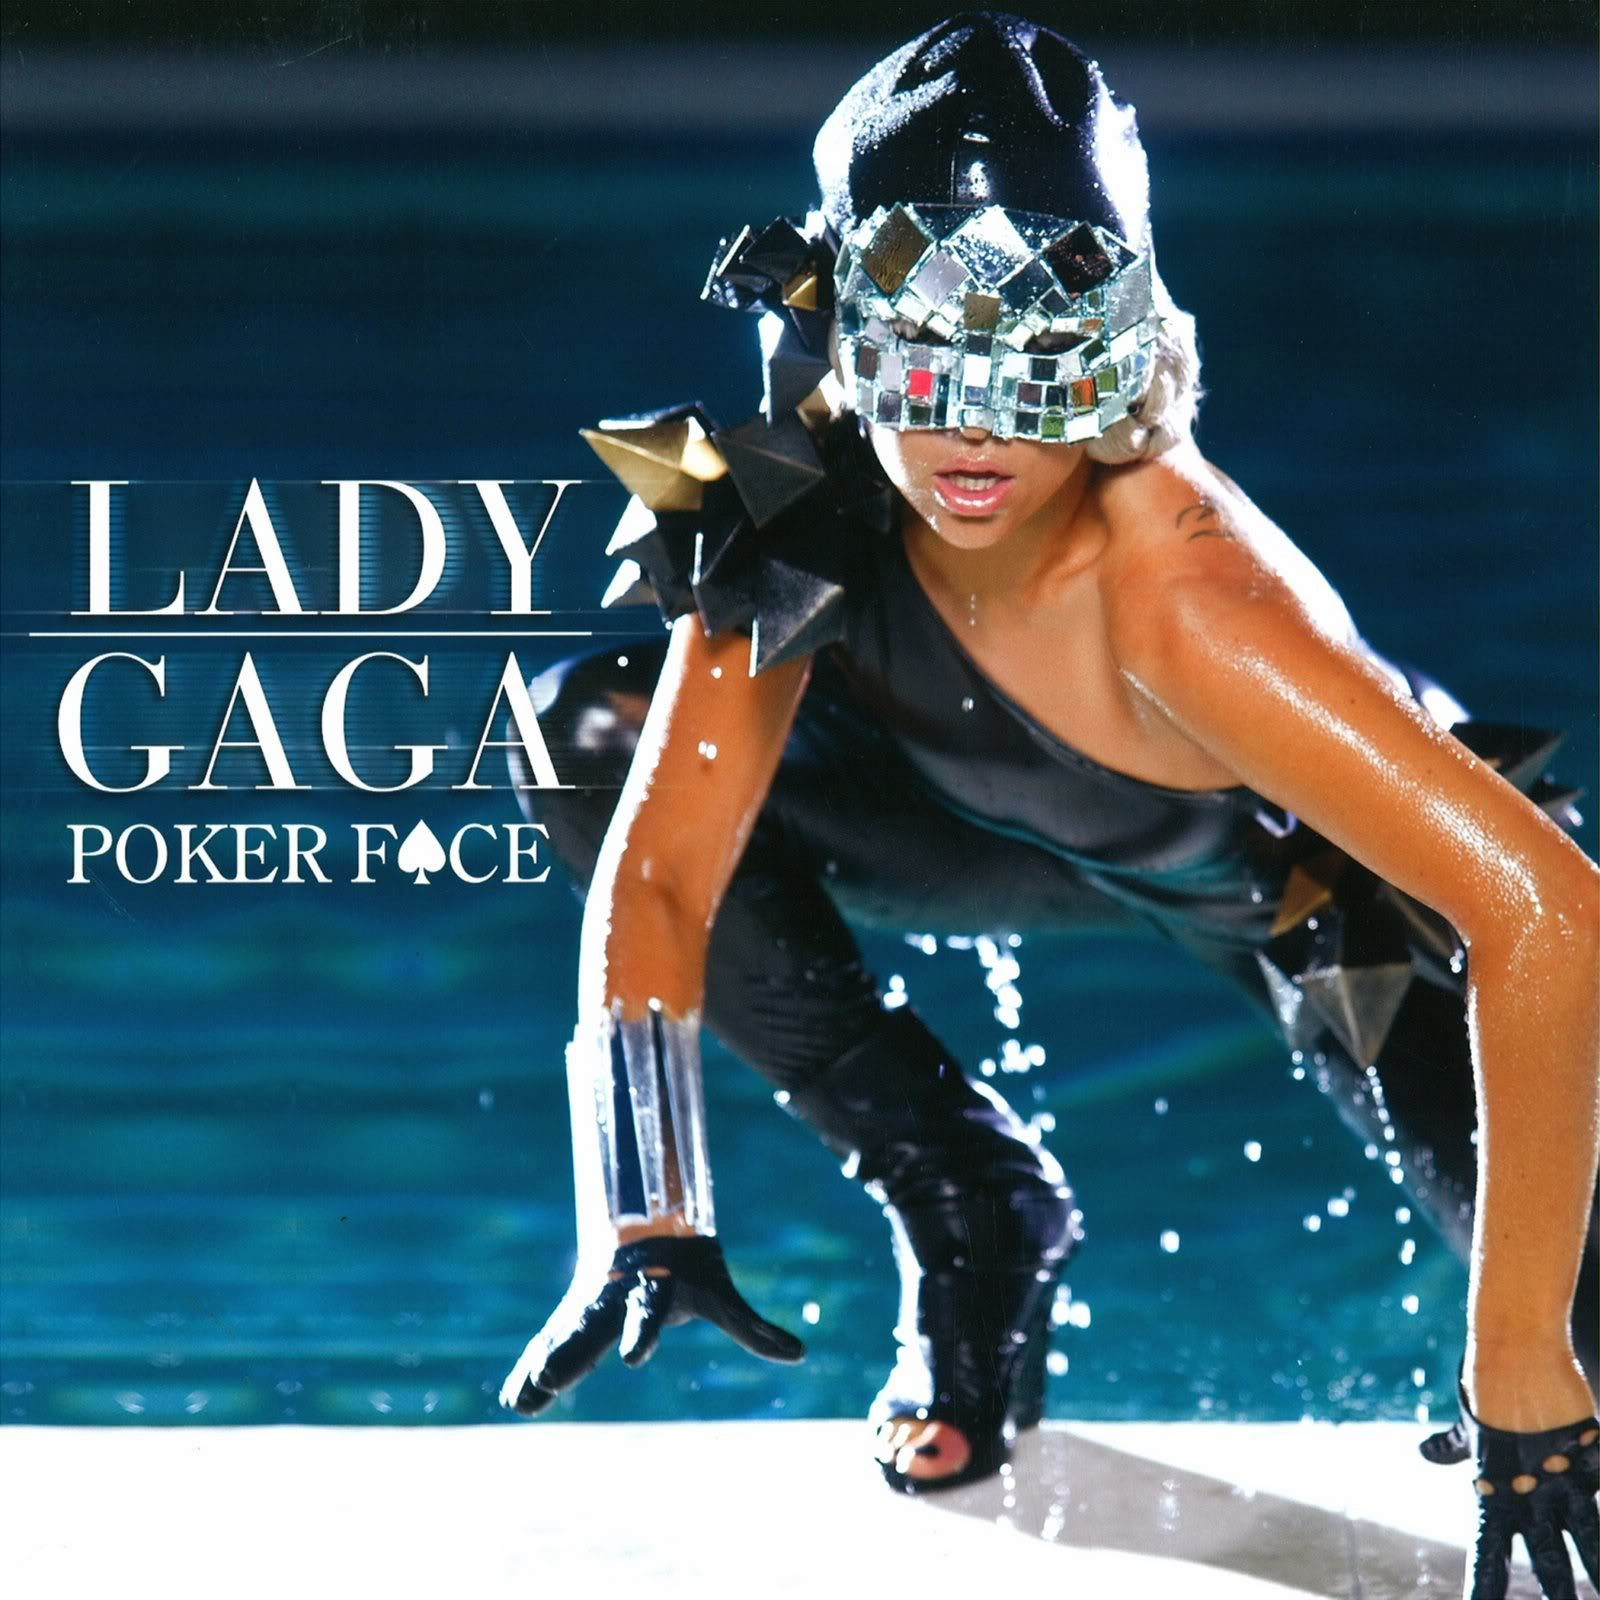 Poker face cover lady gaga